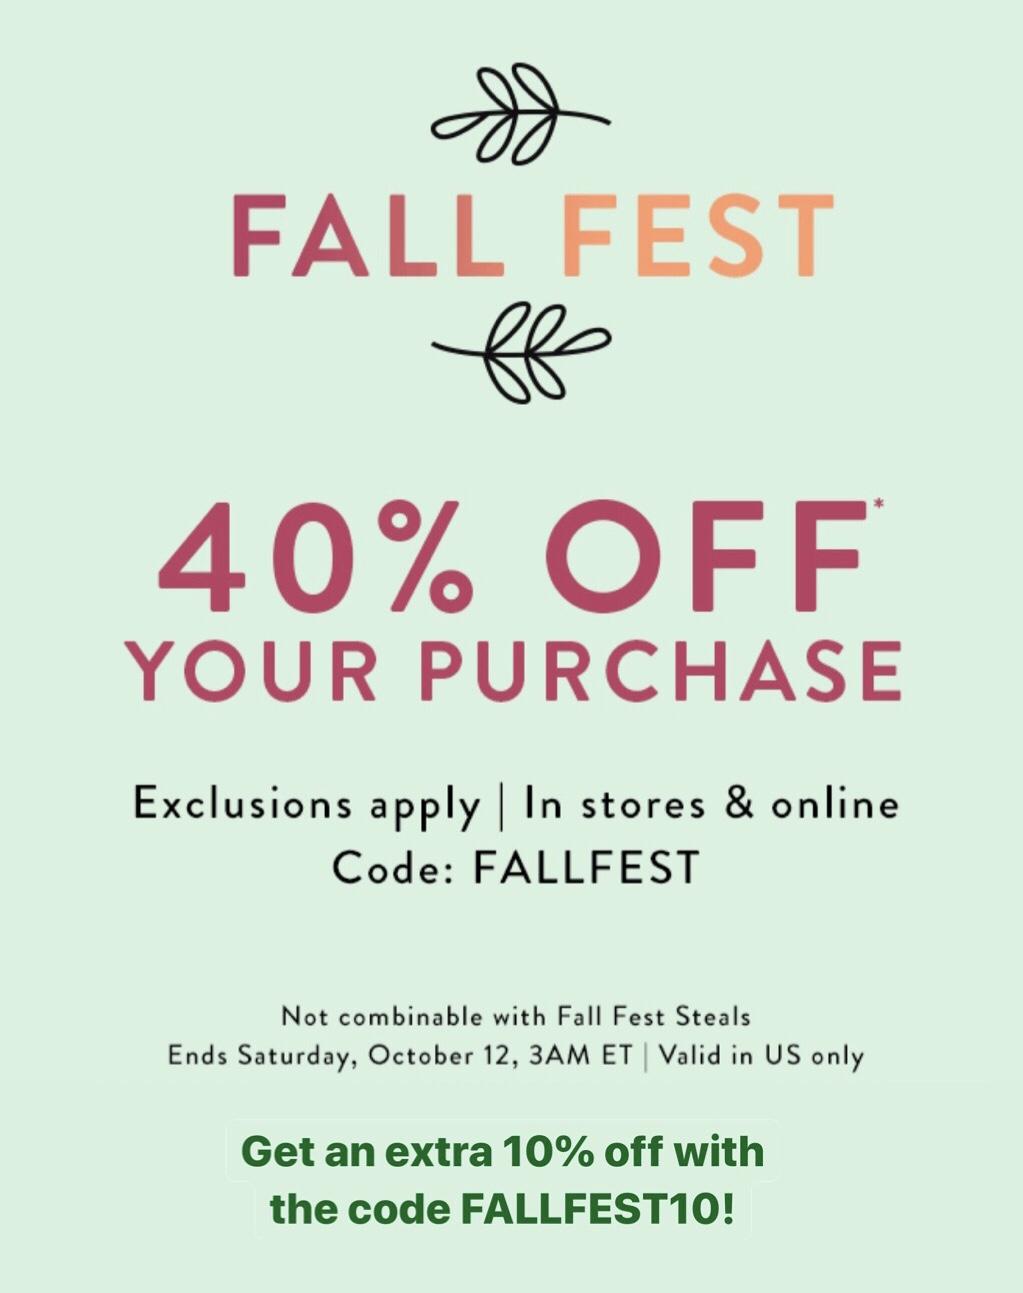 LOFT Fall Fest Sale